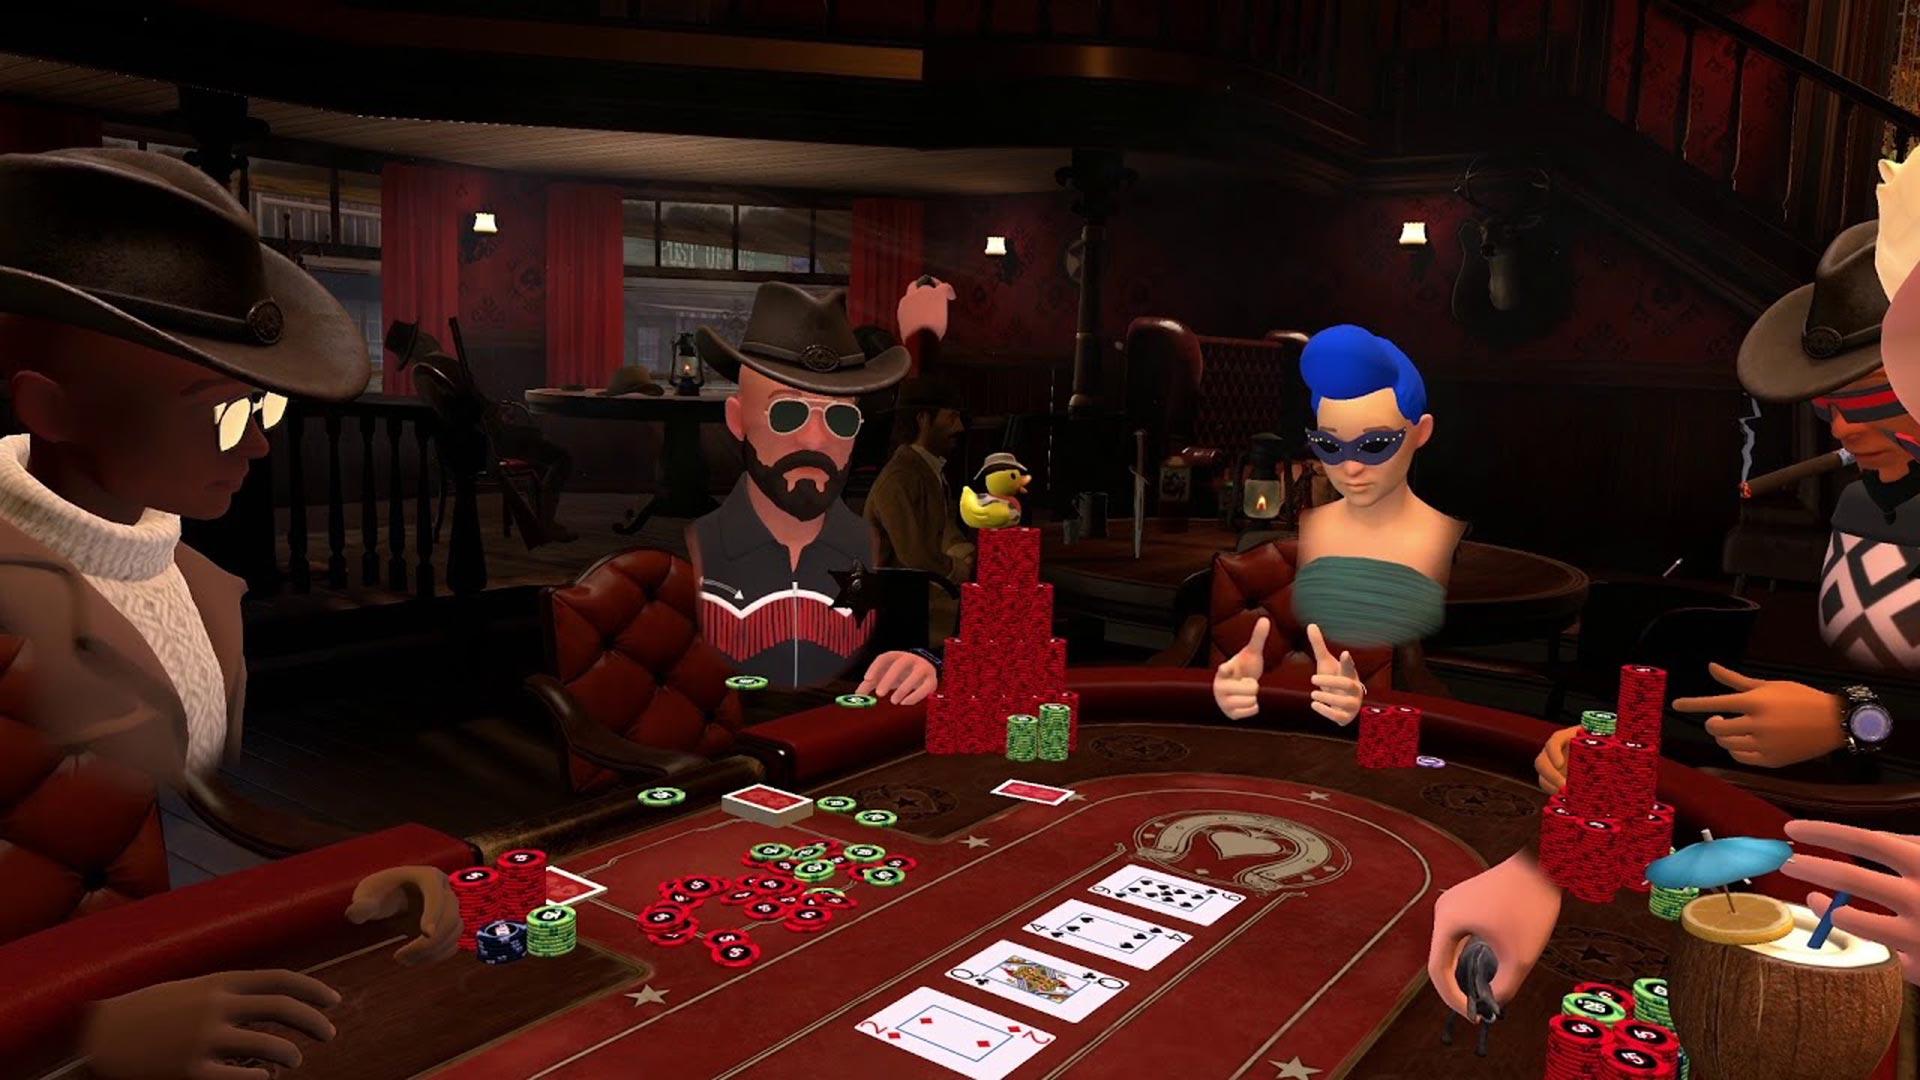 pokerstars vr gameplay wallpaper 73549